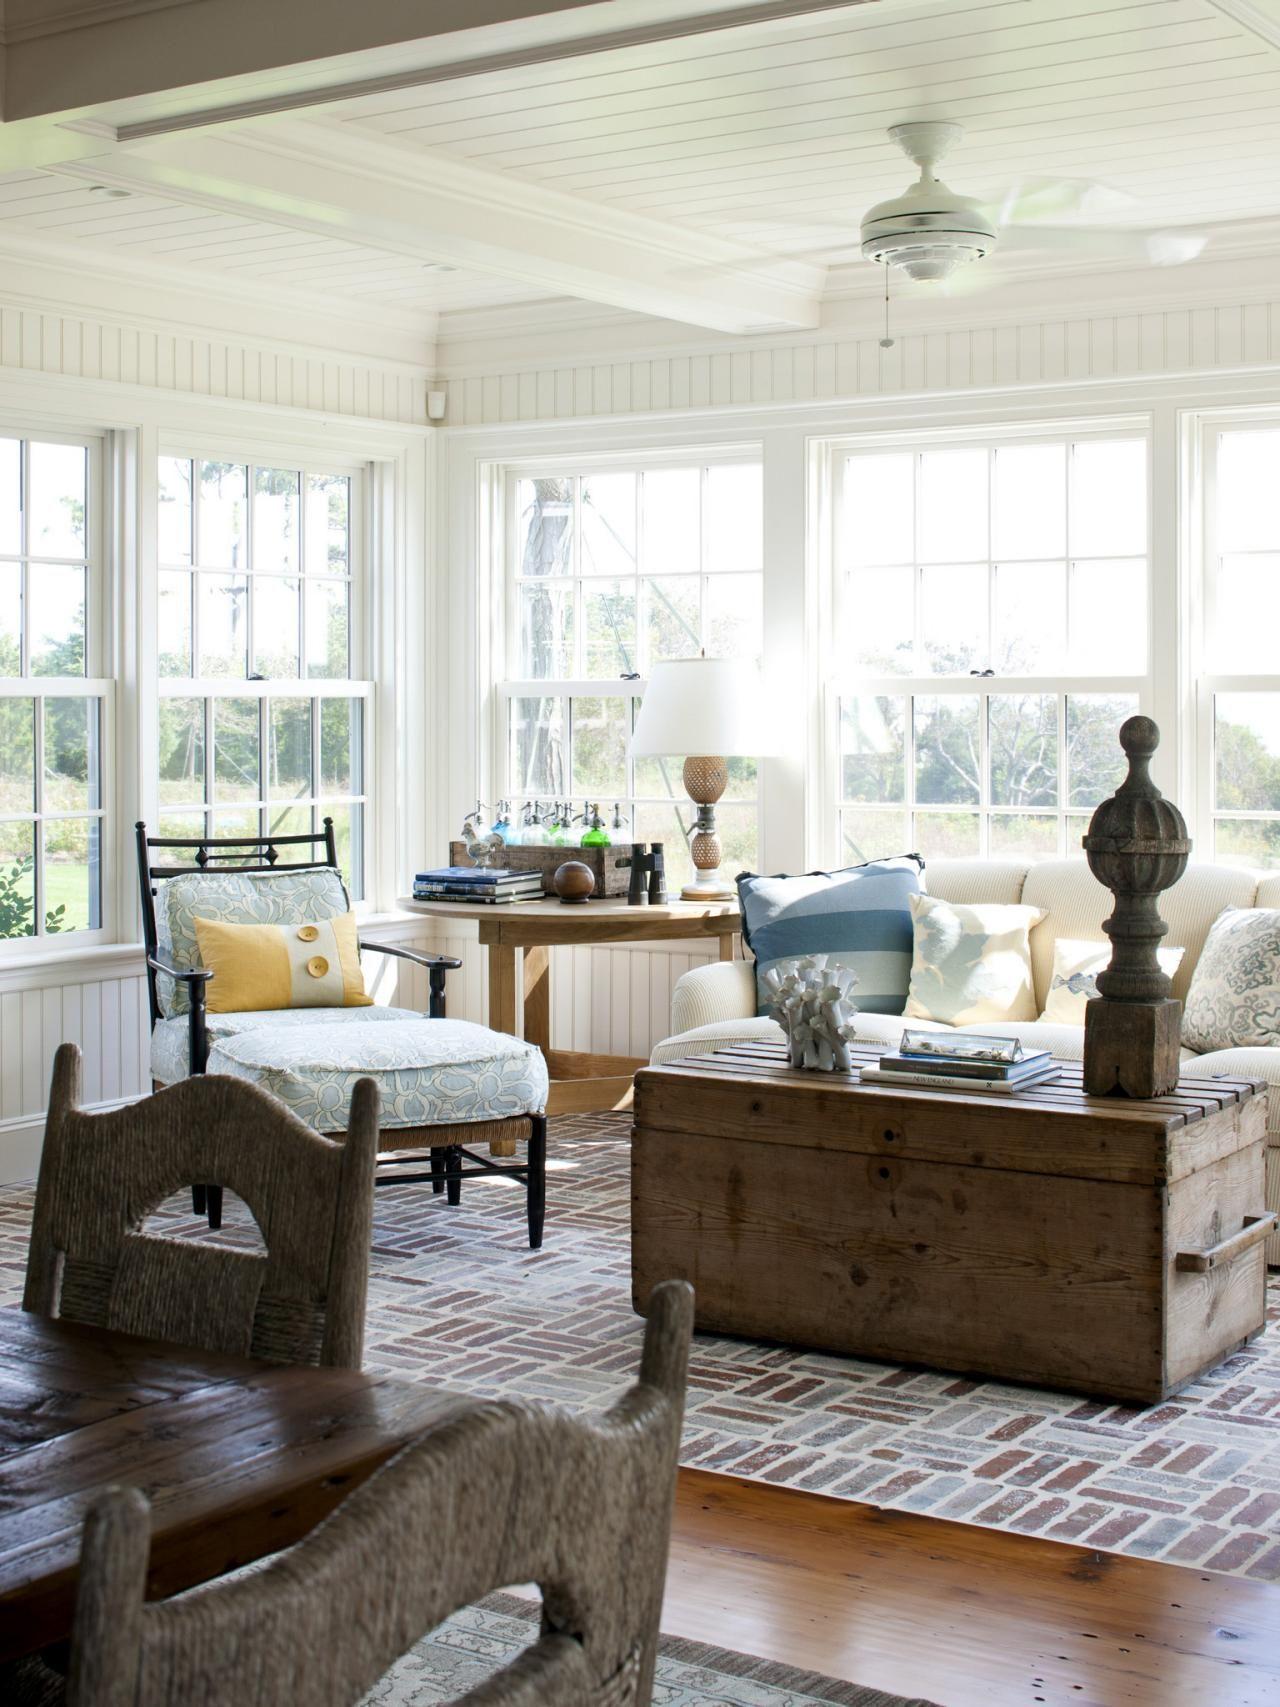 26 Bright + Happy Sunroom Design Ideas in 2020 | Coastal ...